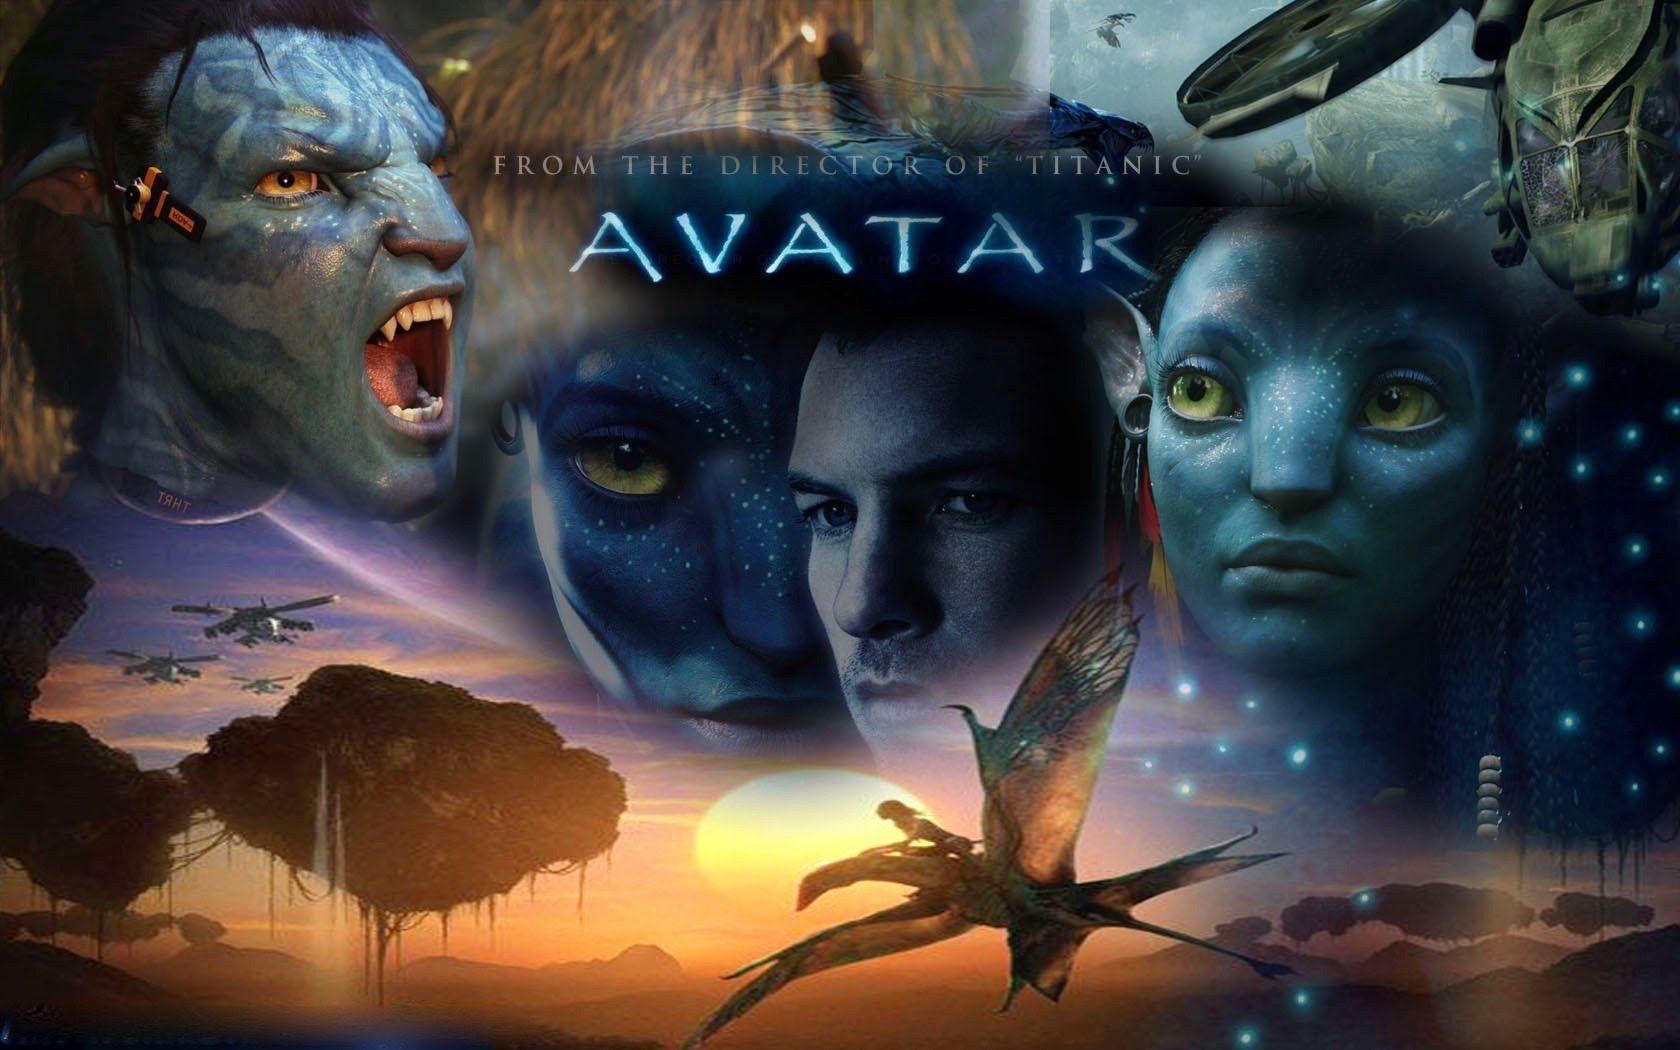 Avatar teljes film magyarul 2009 3D film Pinterest